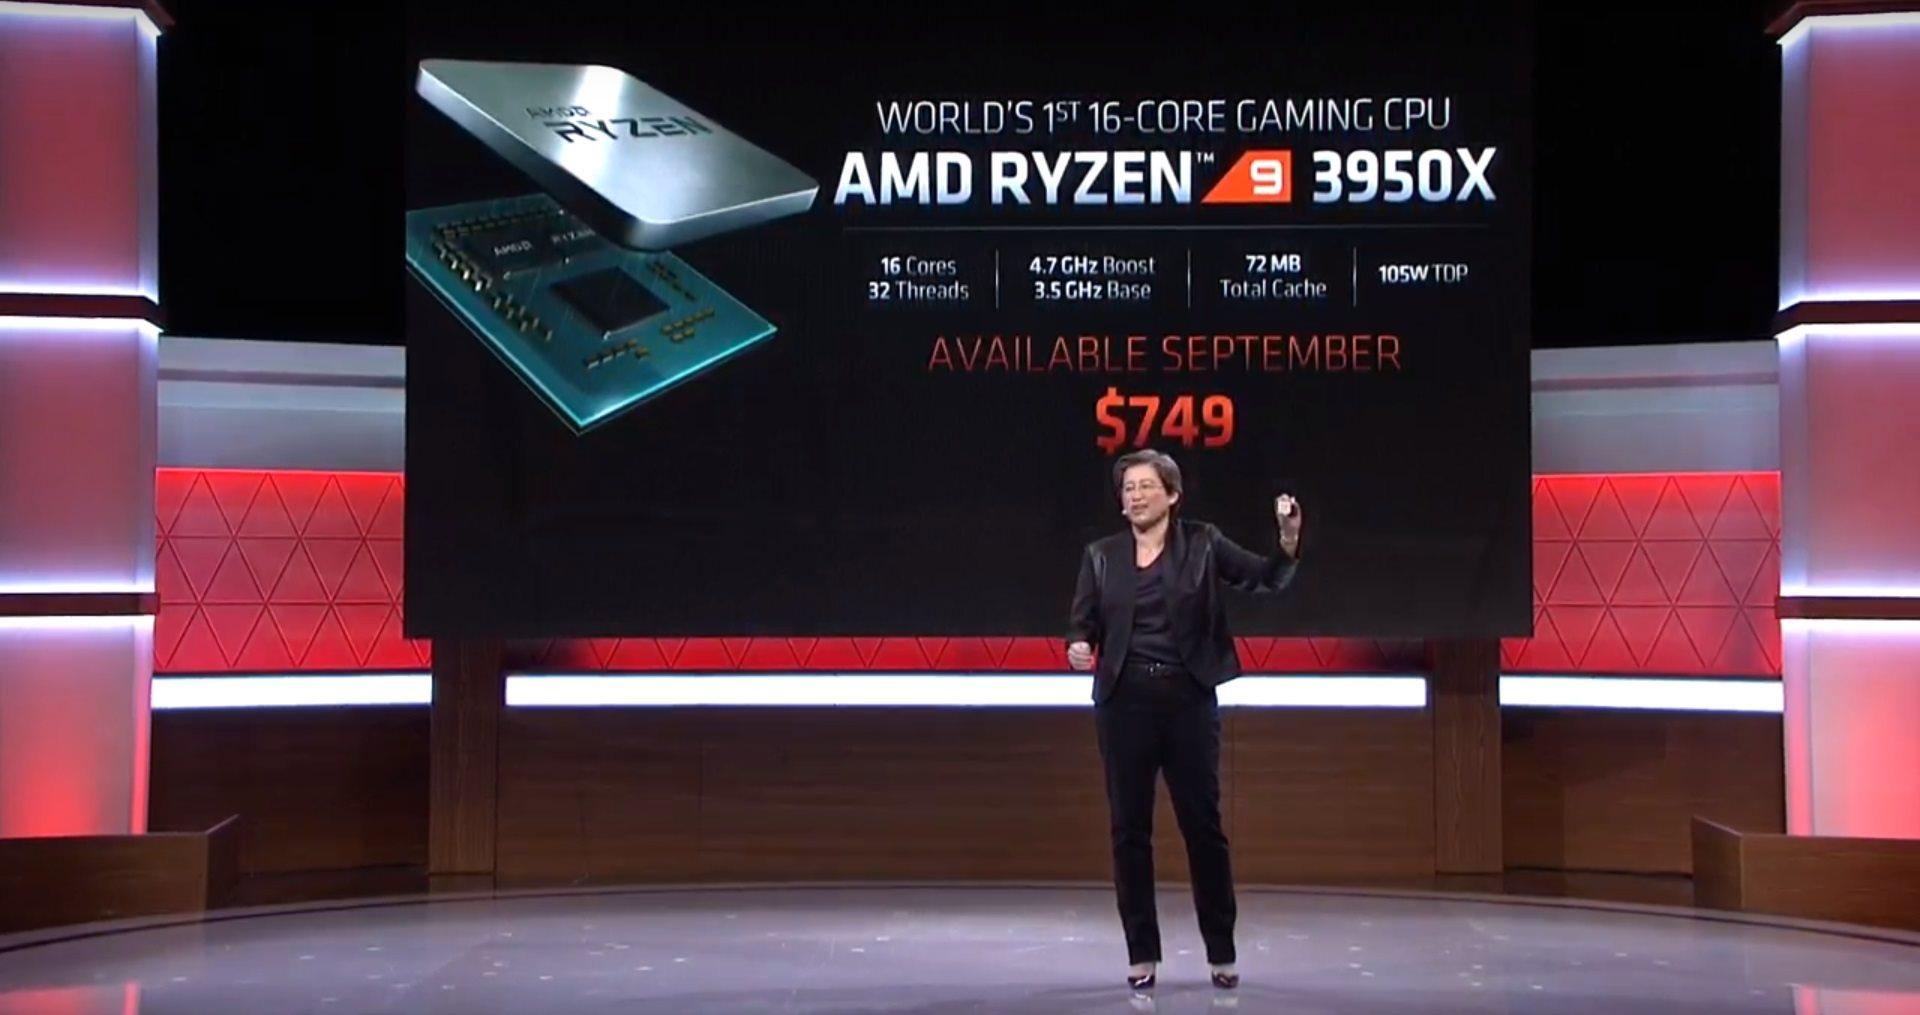 AMD; screenshot: AMD Ryzen 3950x